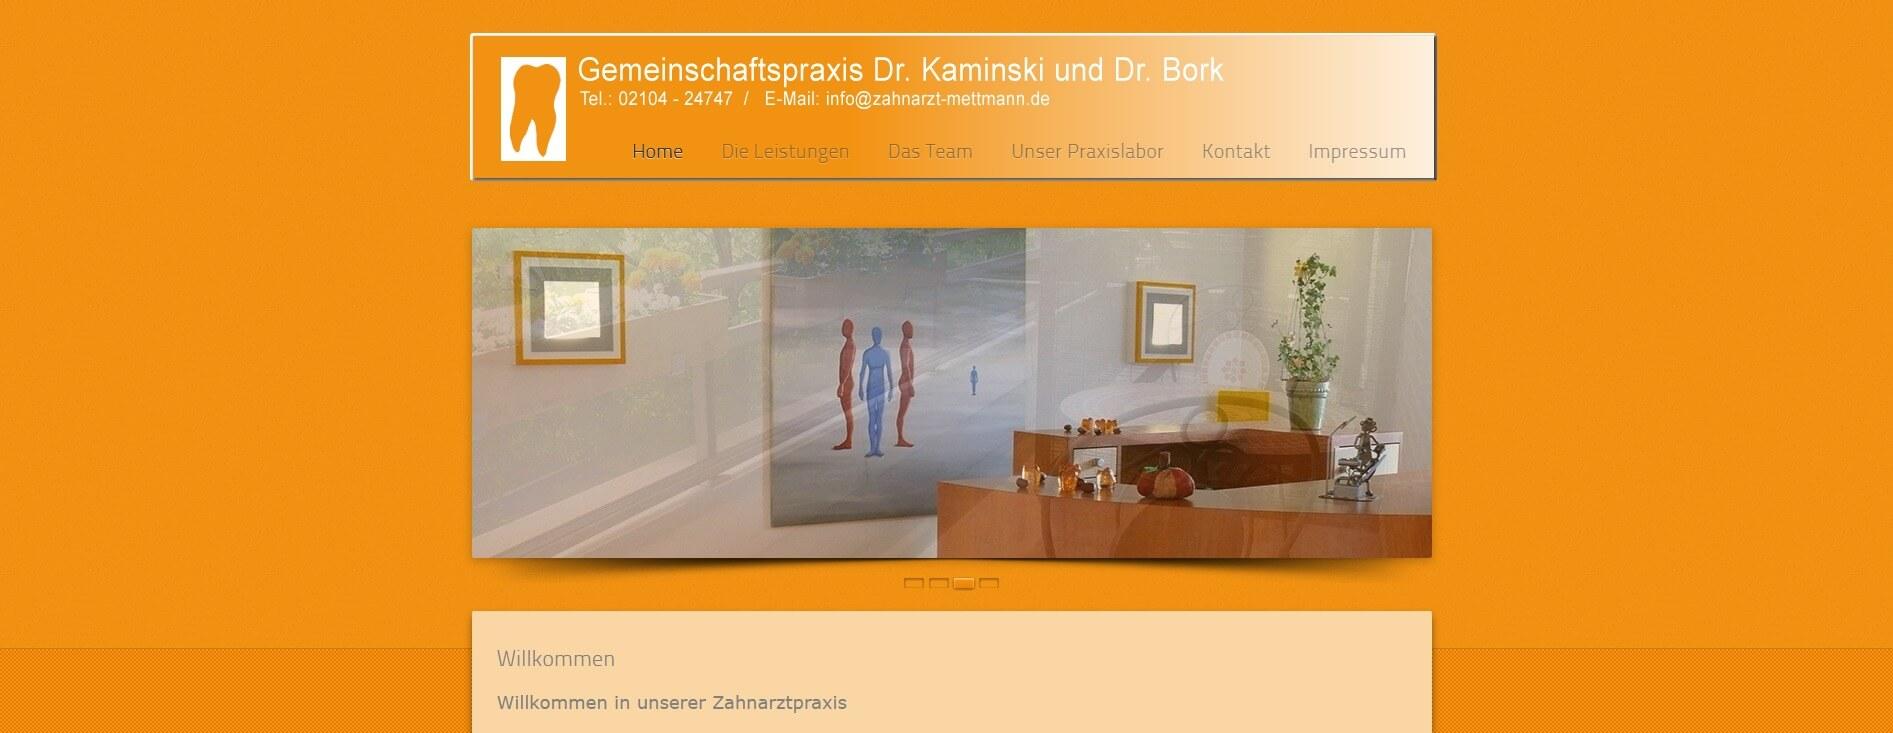 Image of Zahnarztpraxis Dr. Kaminski & Dr. Bork in Mettmann